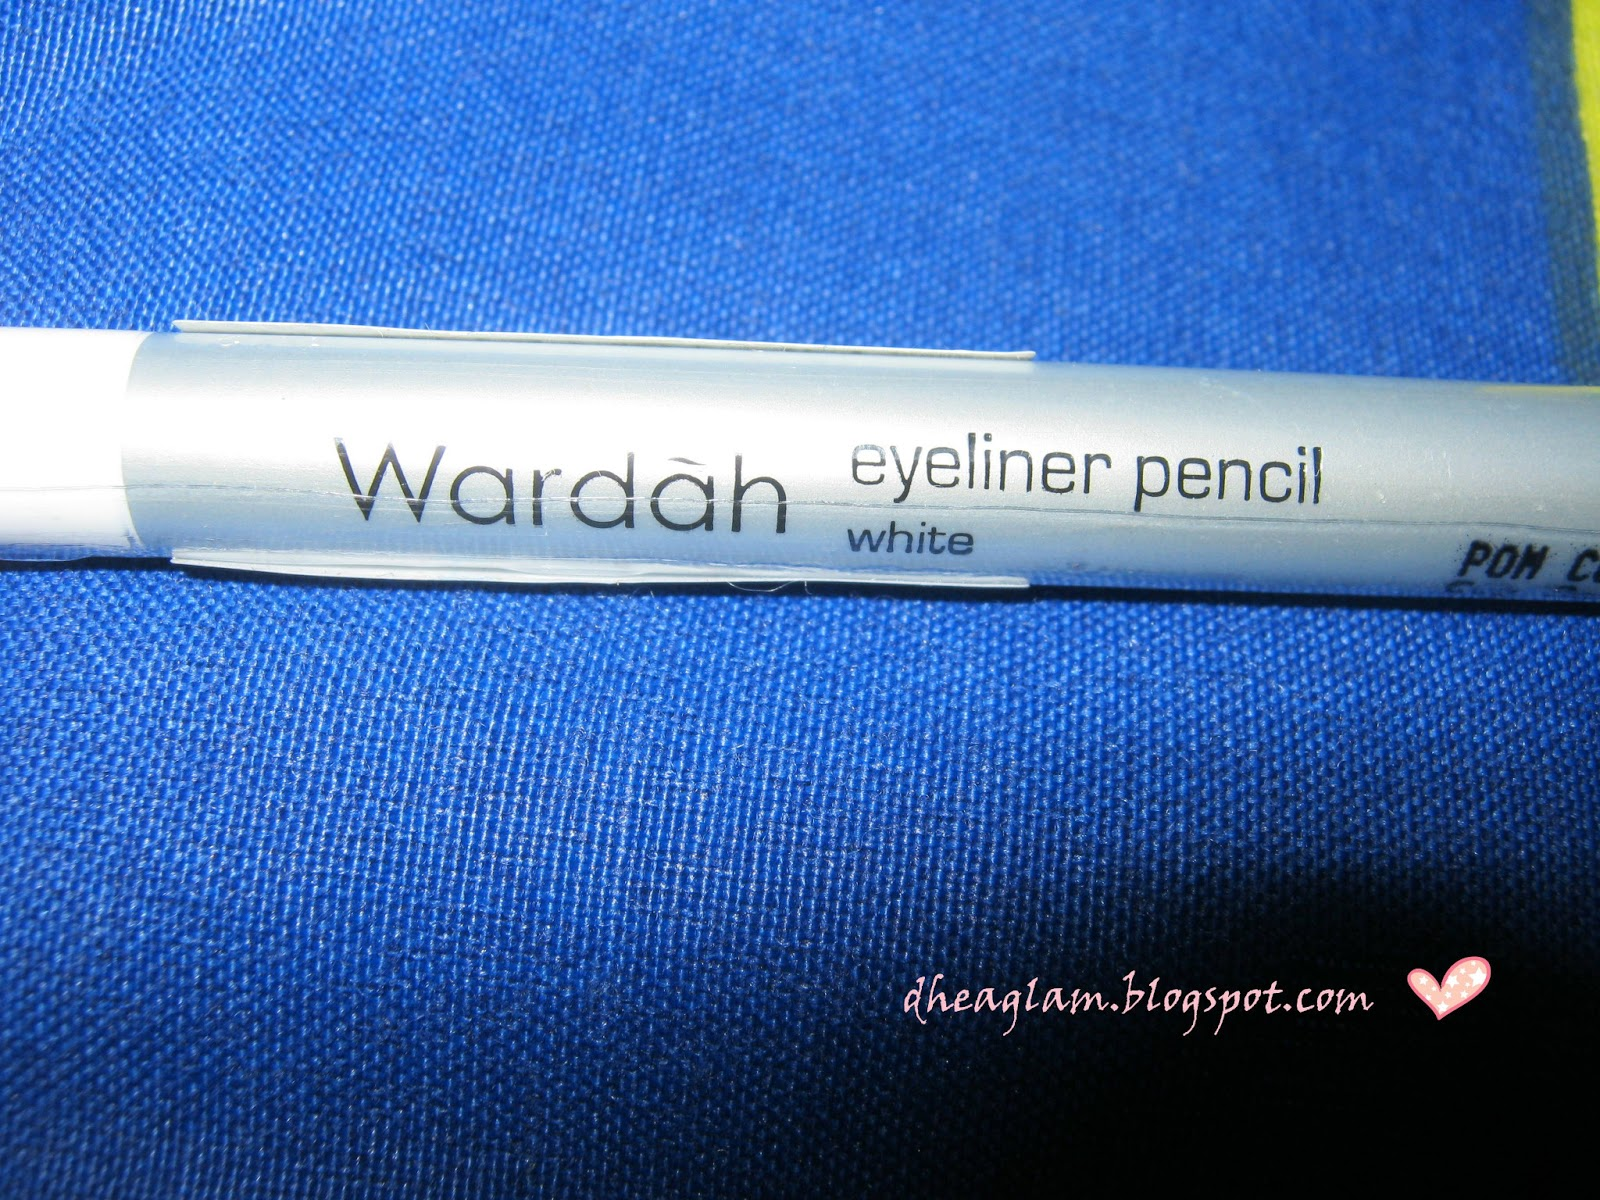 DeeGlam: Wardah eyeliner white pencil